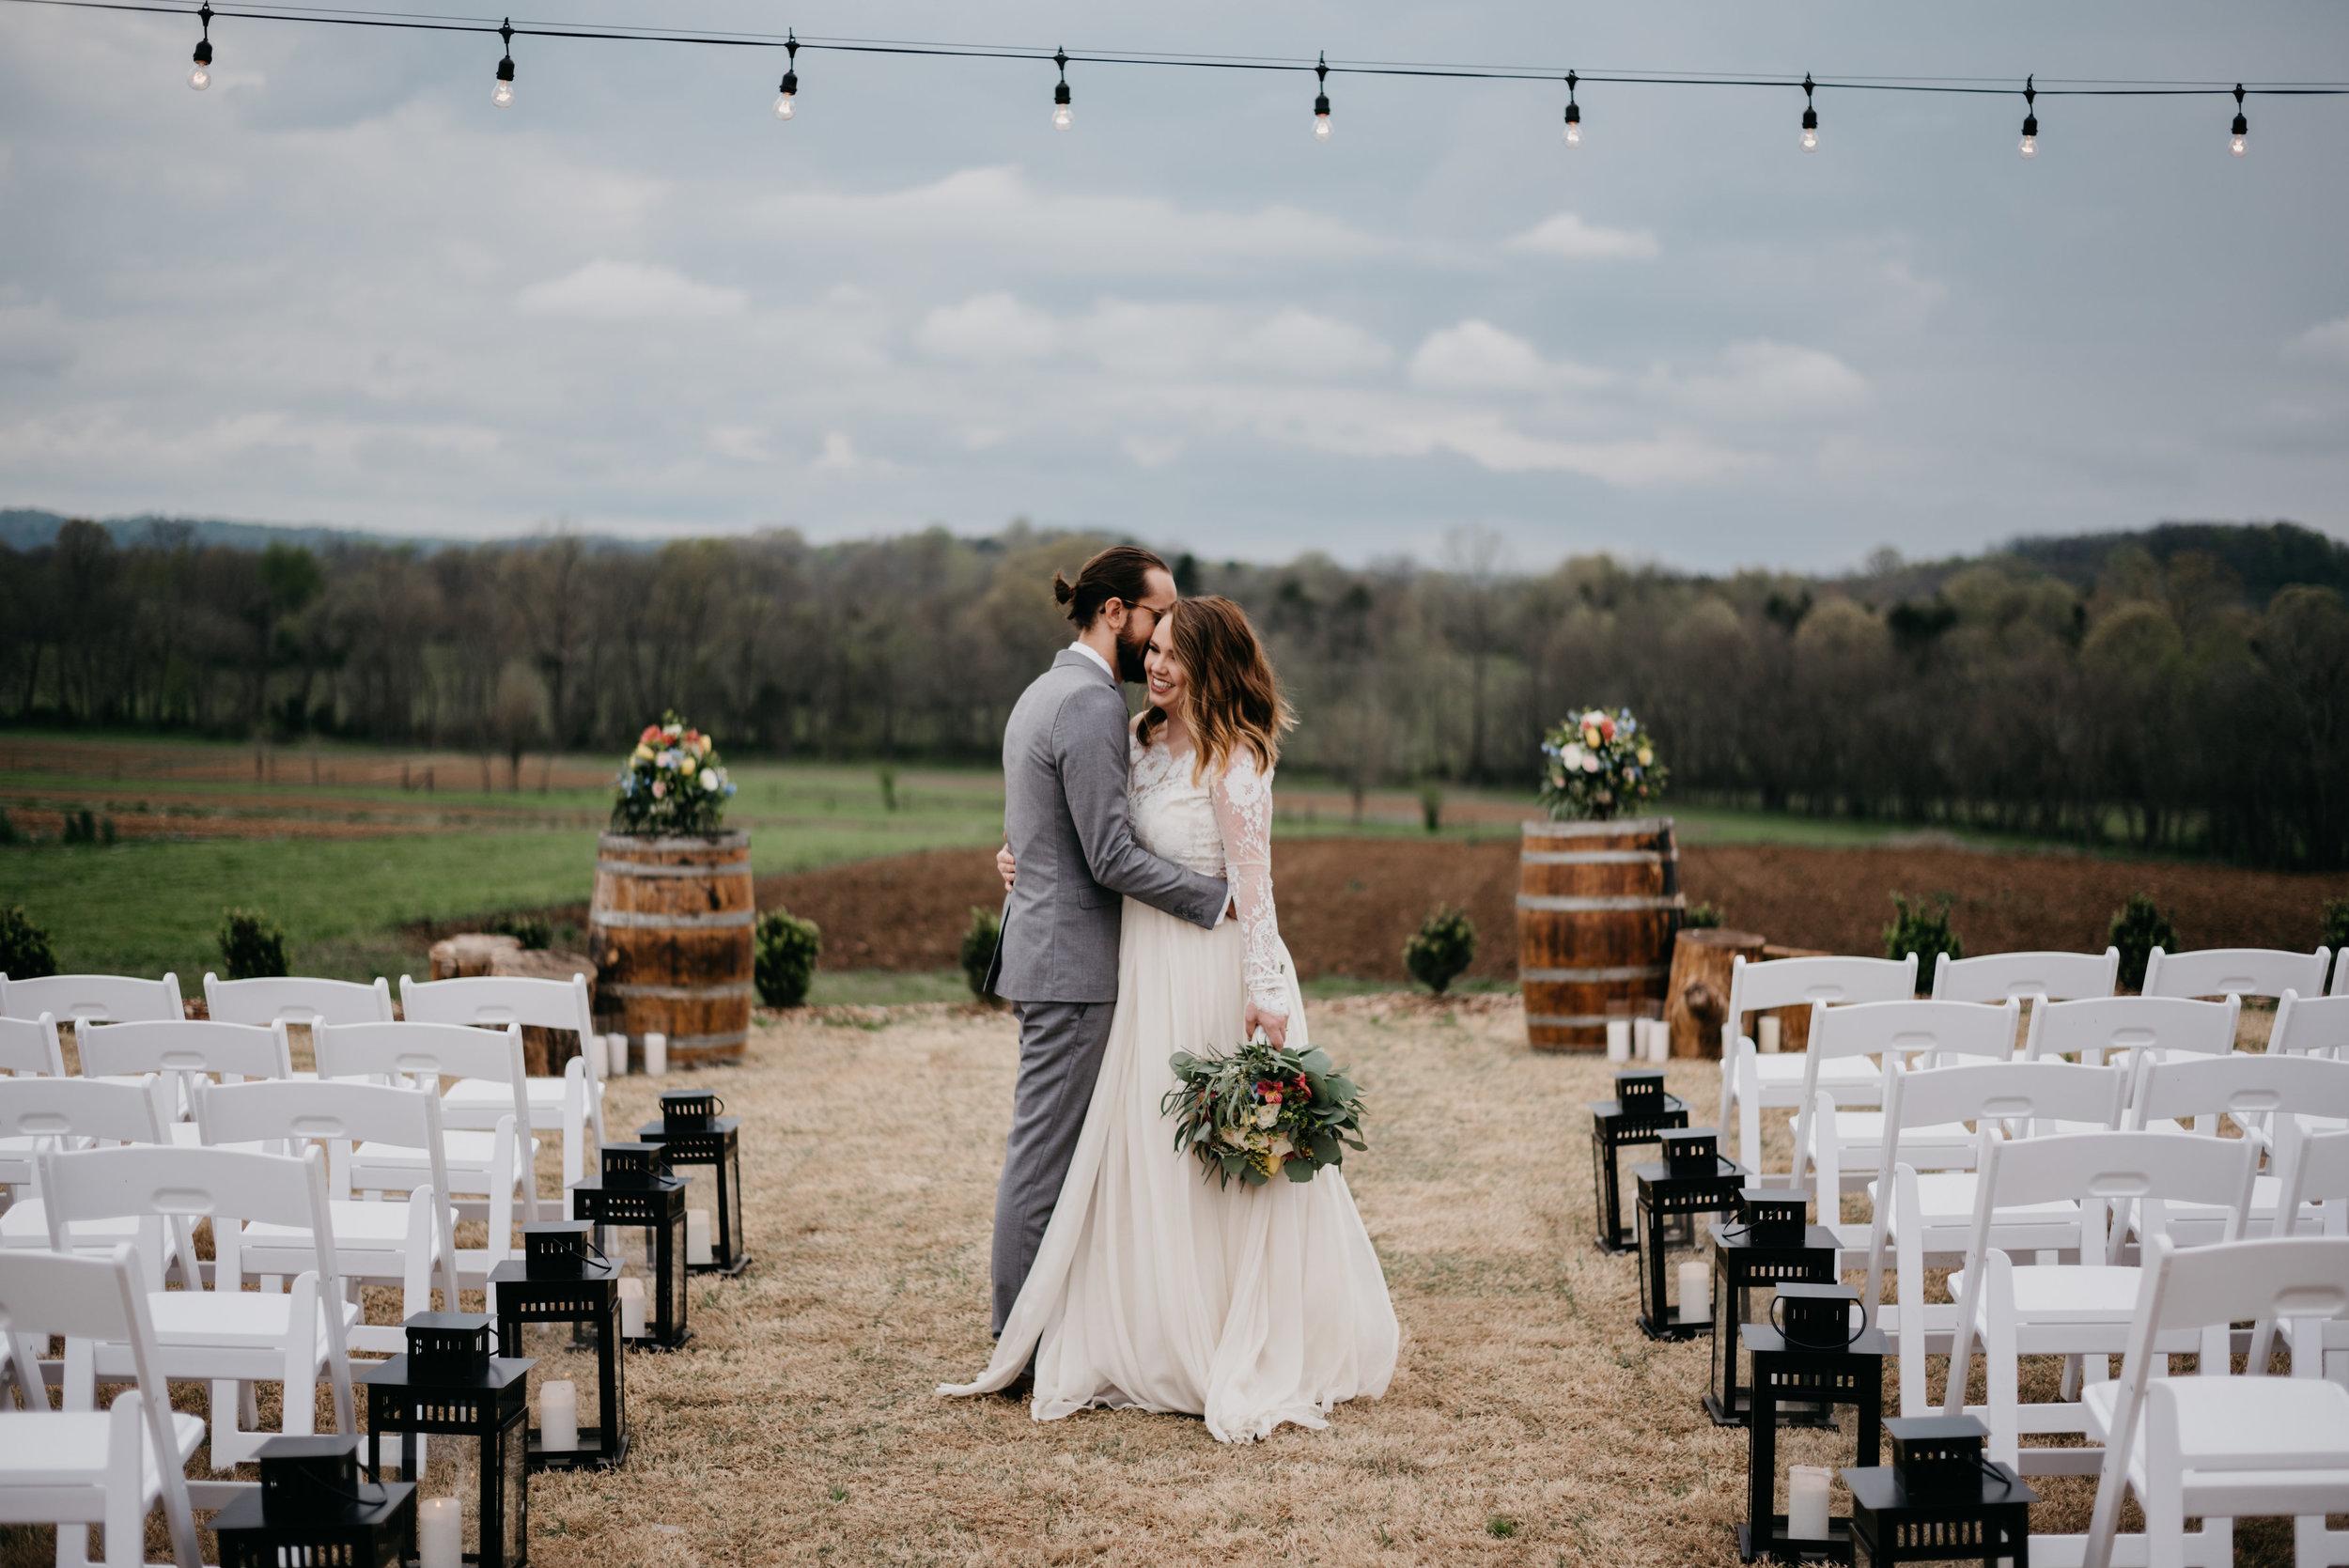 Allenbrooke-Farms-Nashville-Wedding-Photographers 19.jpg